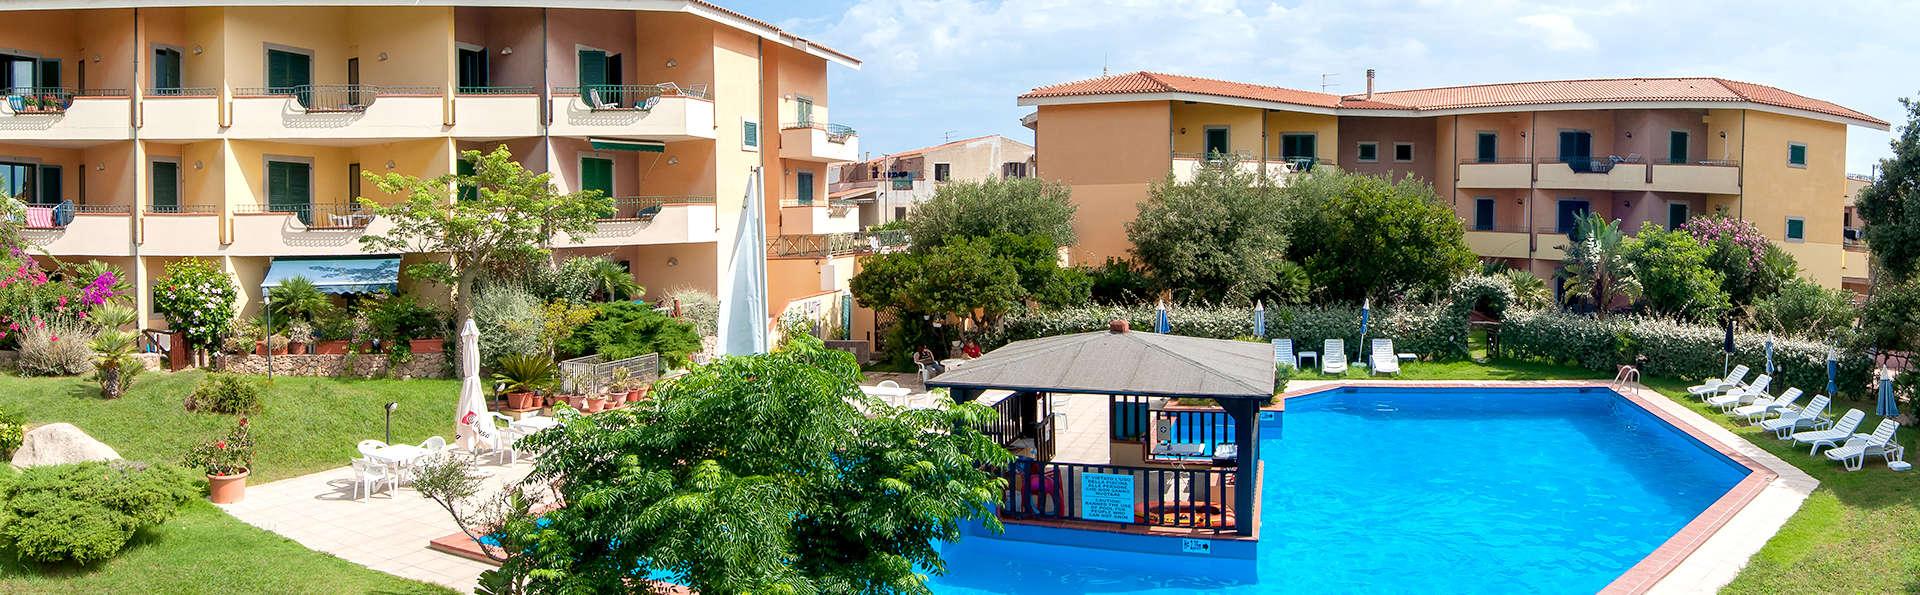 Residence I Mirti Bianchi - Edit_Pool3.jpg